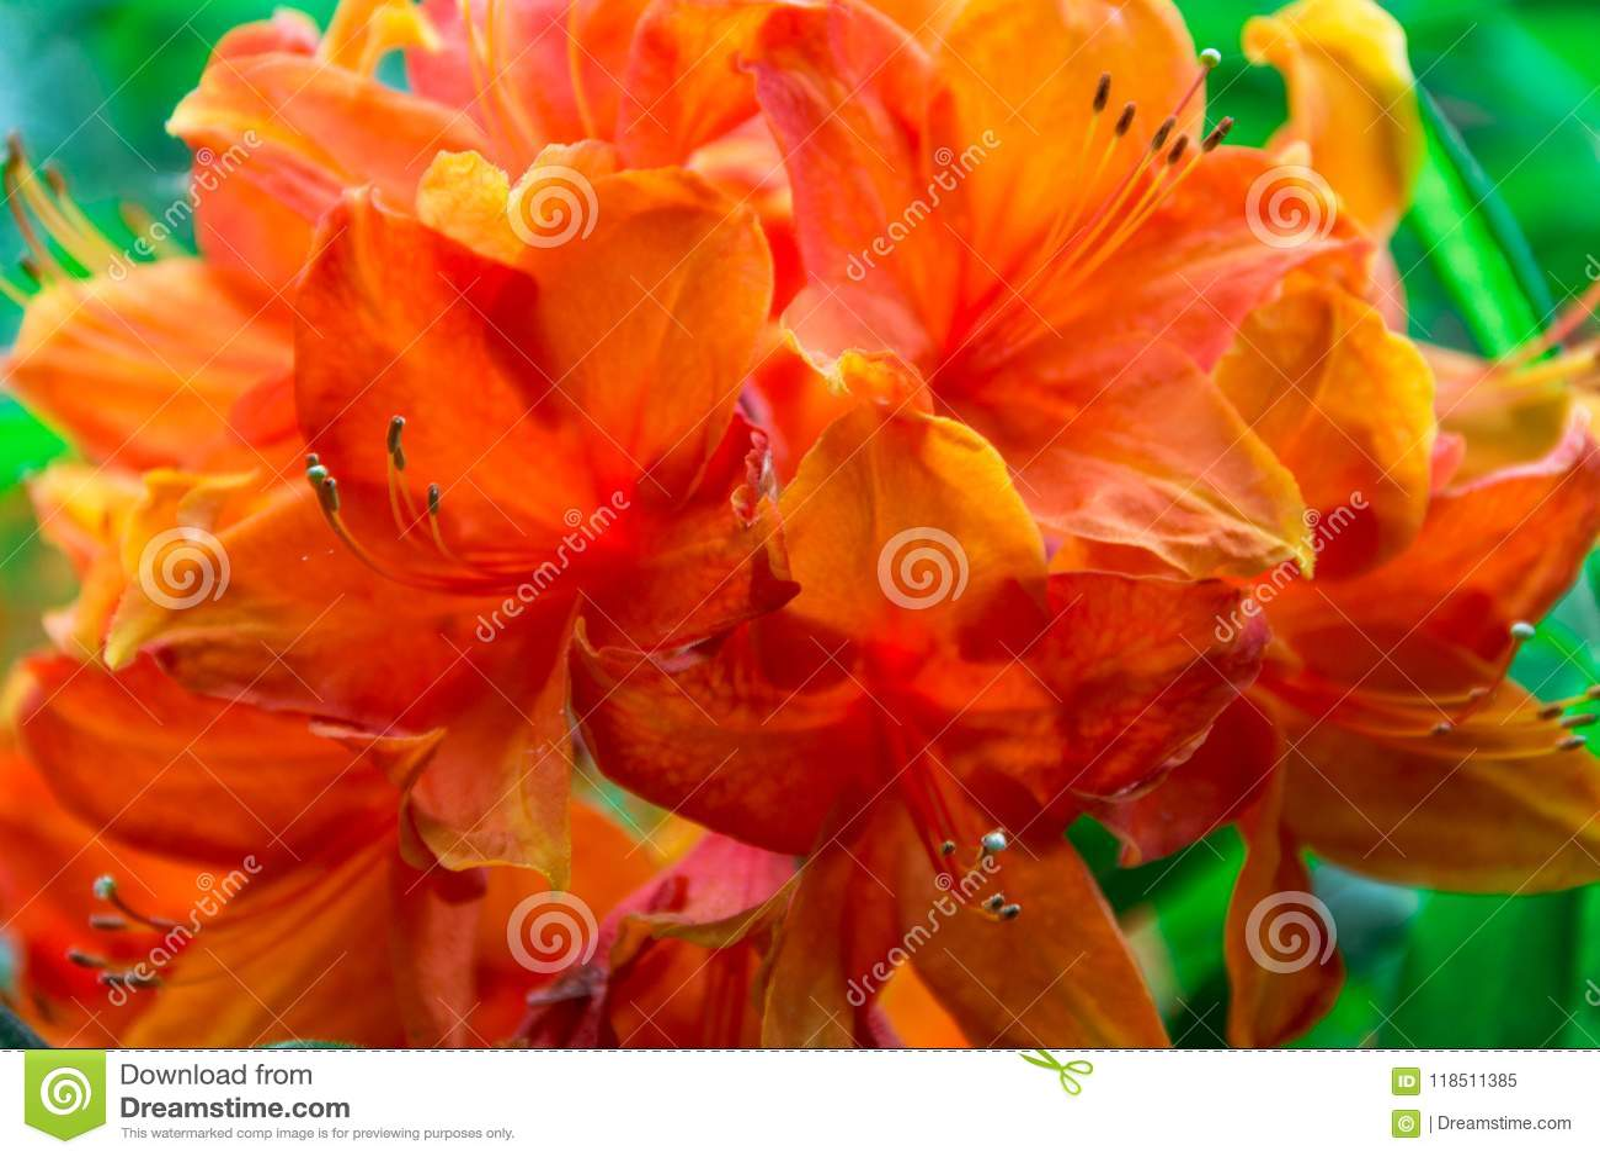 Spring Flowers Close Up Large Saggy Flower For Design Stock Image